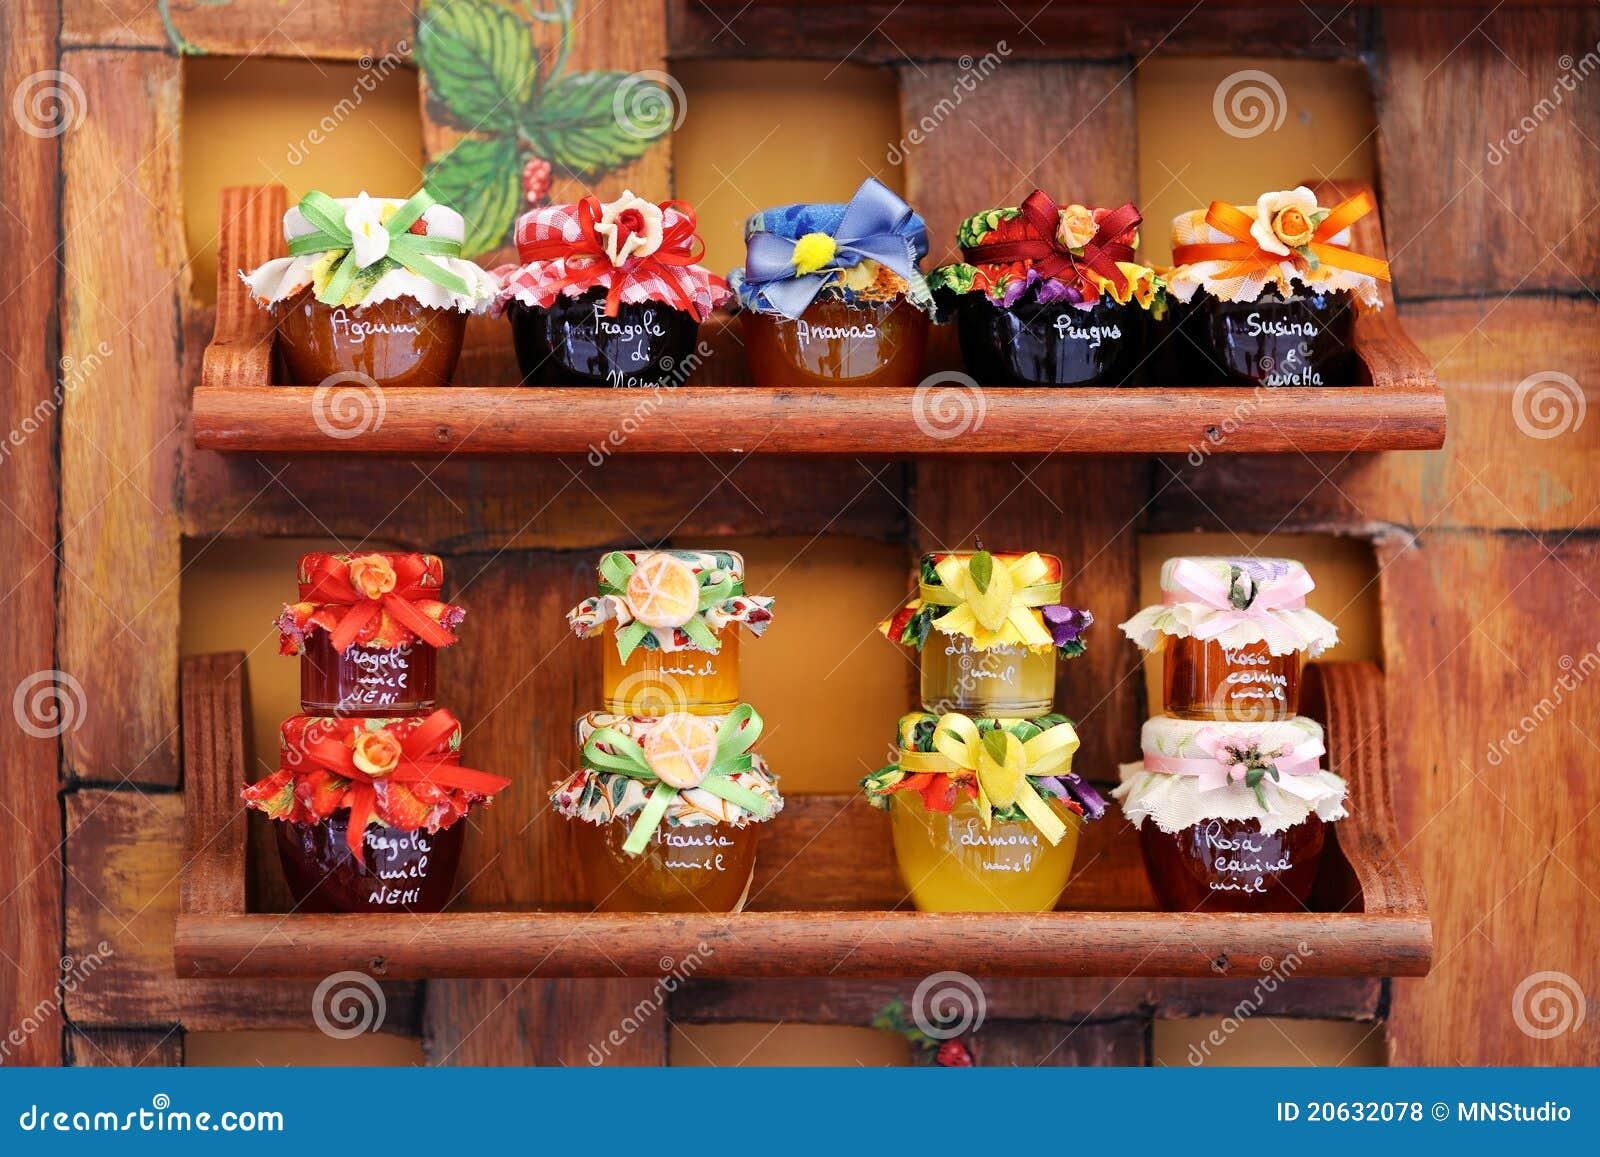 jam jars arranged for sale royalty free stock photos. Black Bedroom Furniture Sets. Home Design Ideas